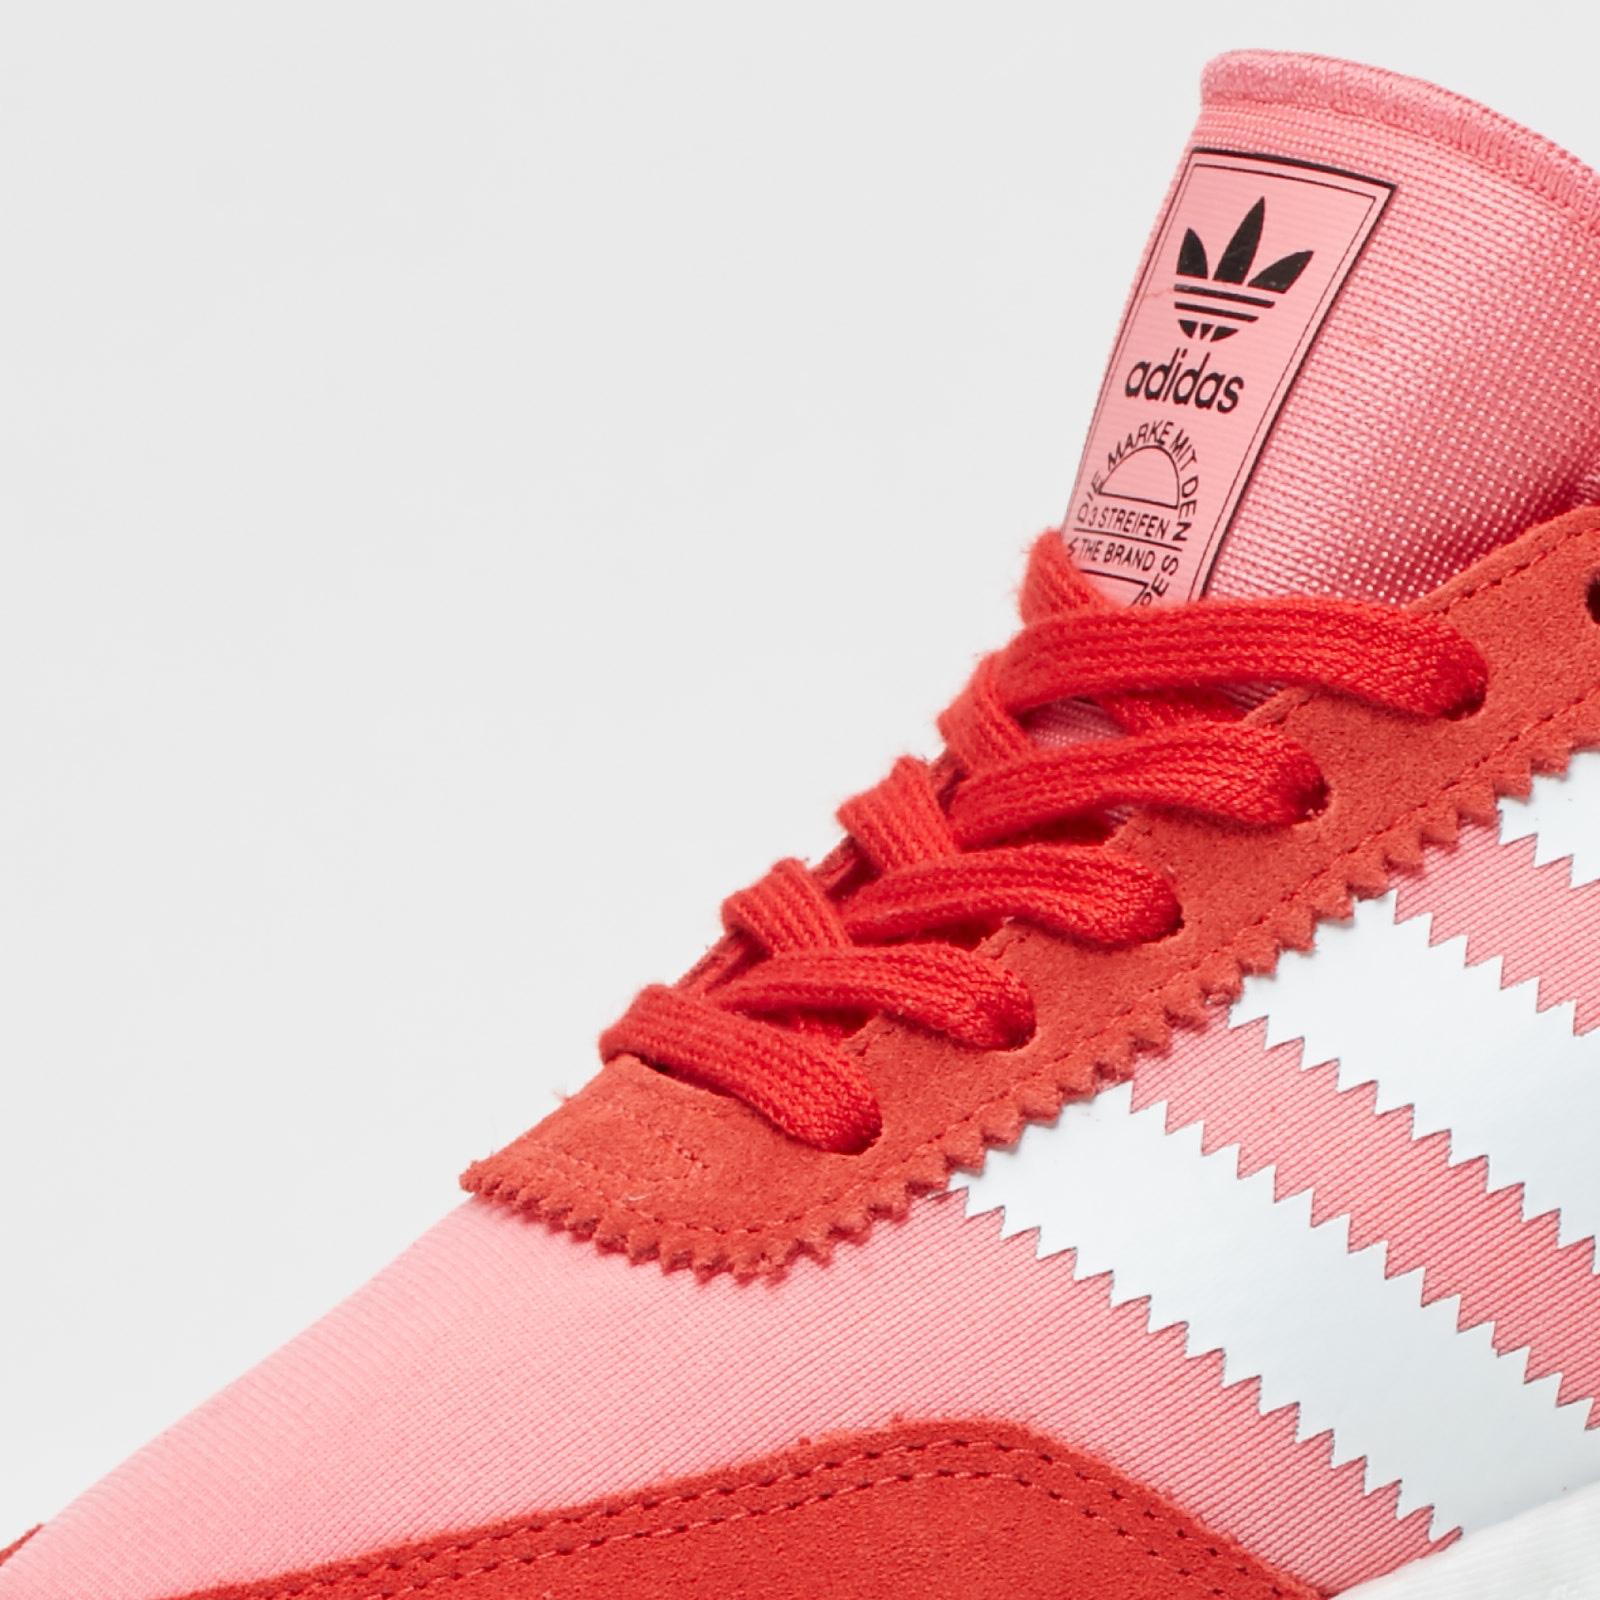 Adidas 5923 Sneakersamp; I Sneakersnstuff W Streetwear Cq2527 N8nkw0OXP